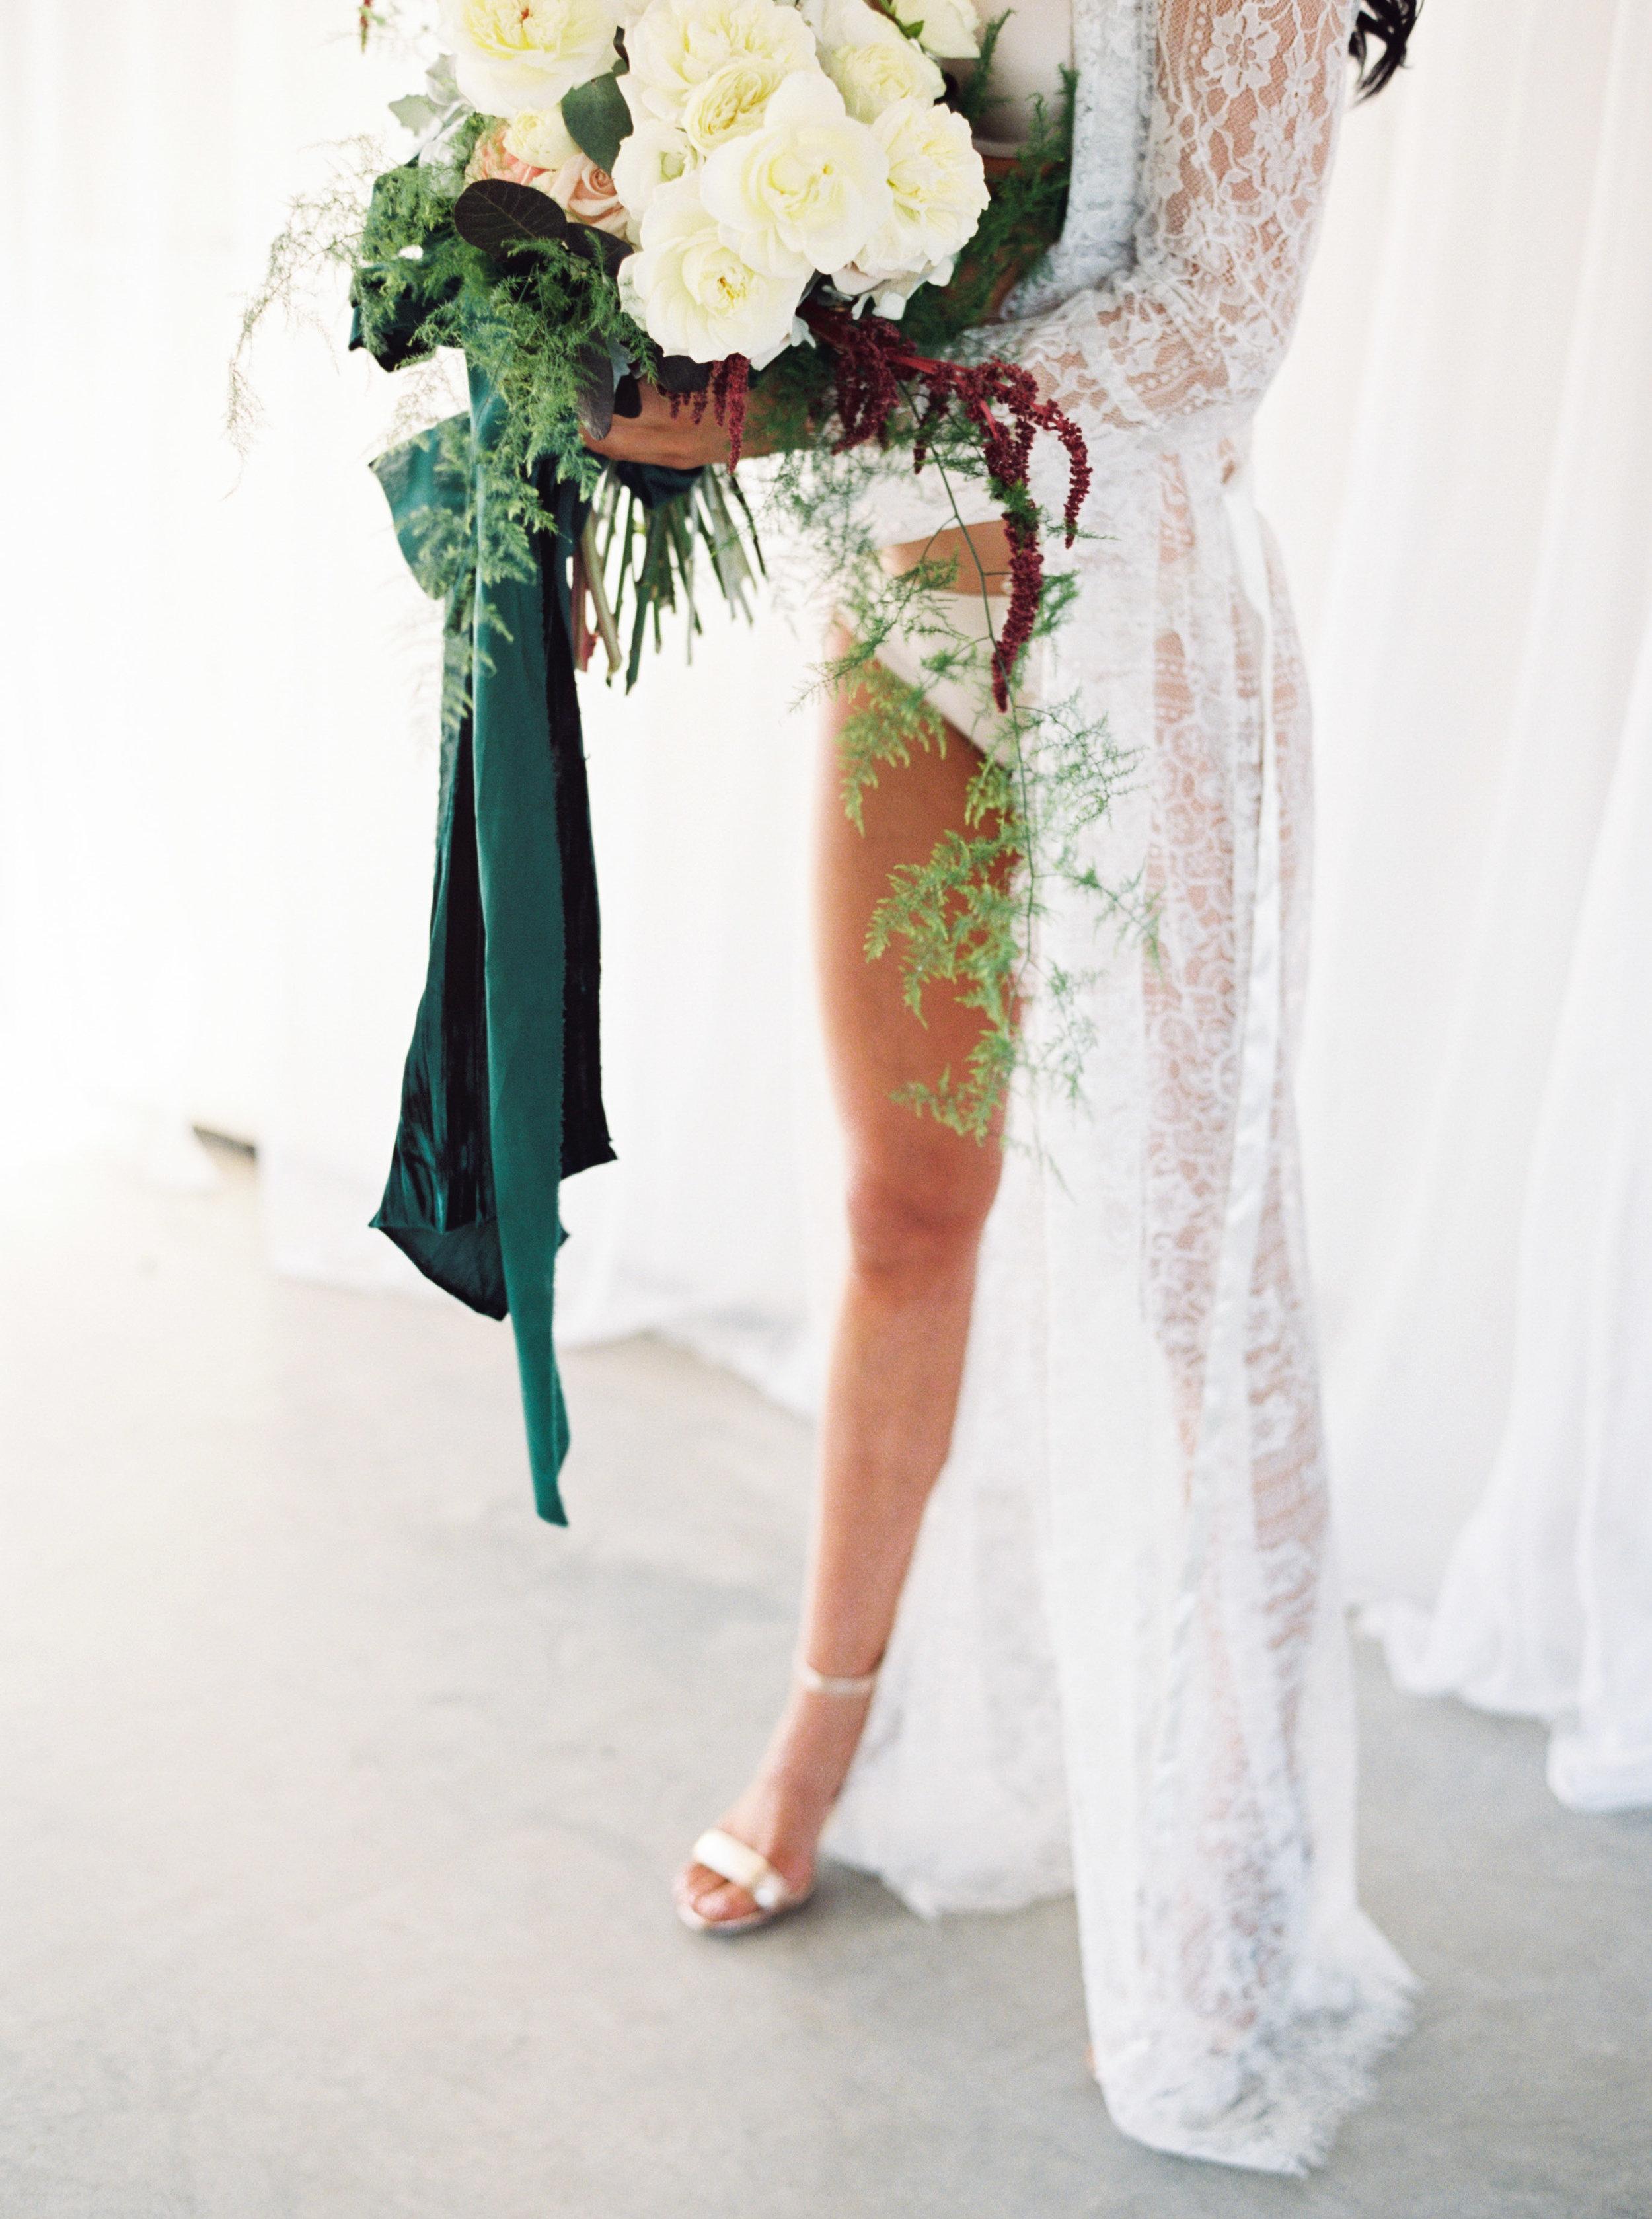 00029- Mudgee Wedding Photographer Sheri McMahon.jpg